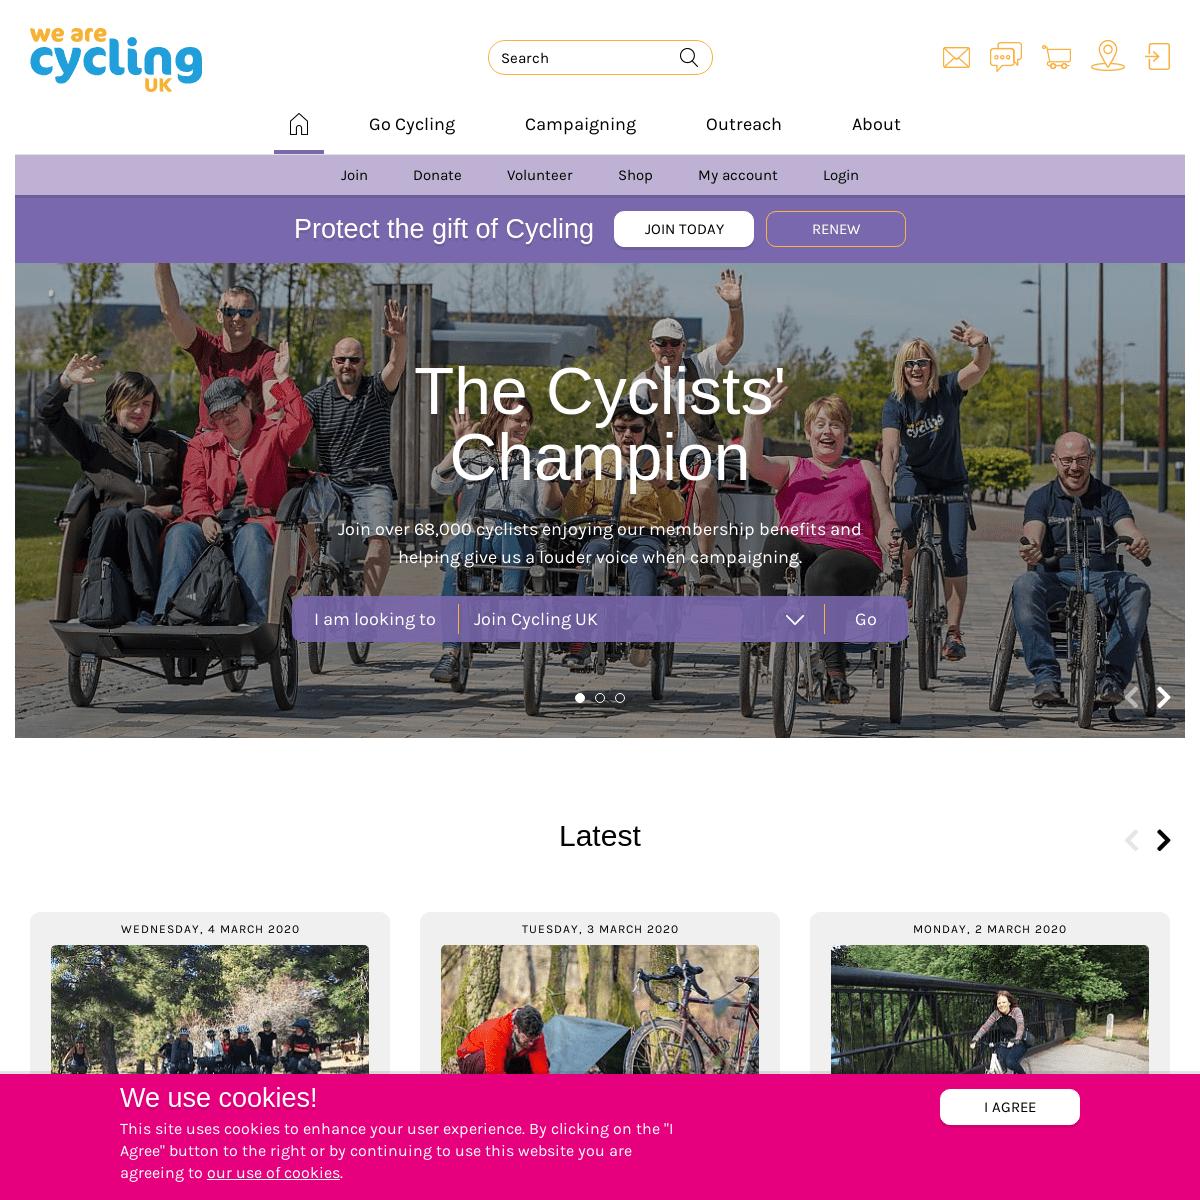 Cycling UK - The Cyclists' Champion